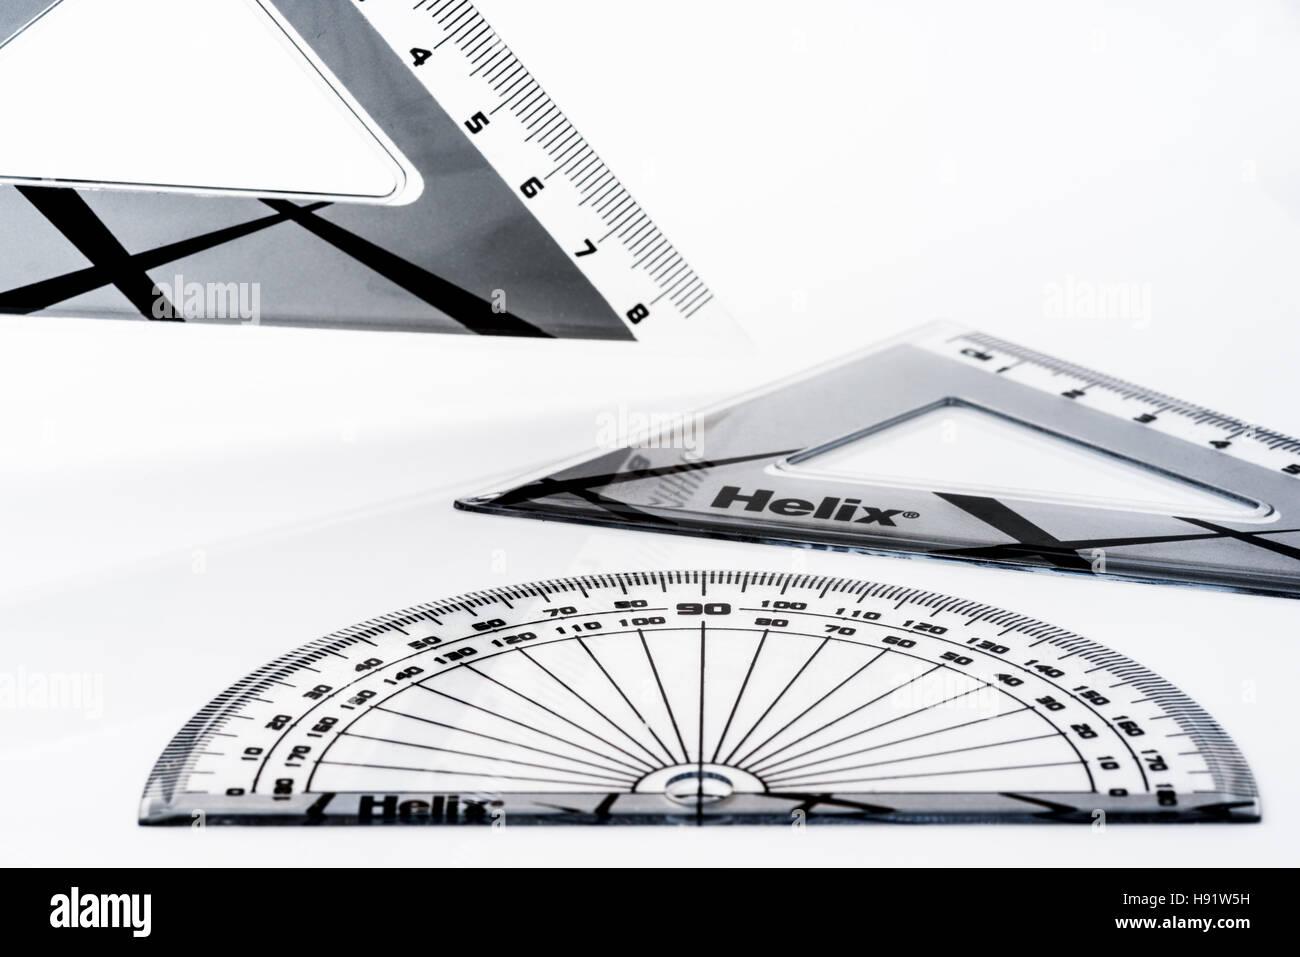 Technical drawing set. plastic geometry equipment. - Stock Image